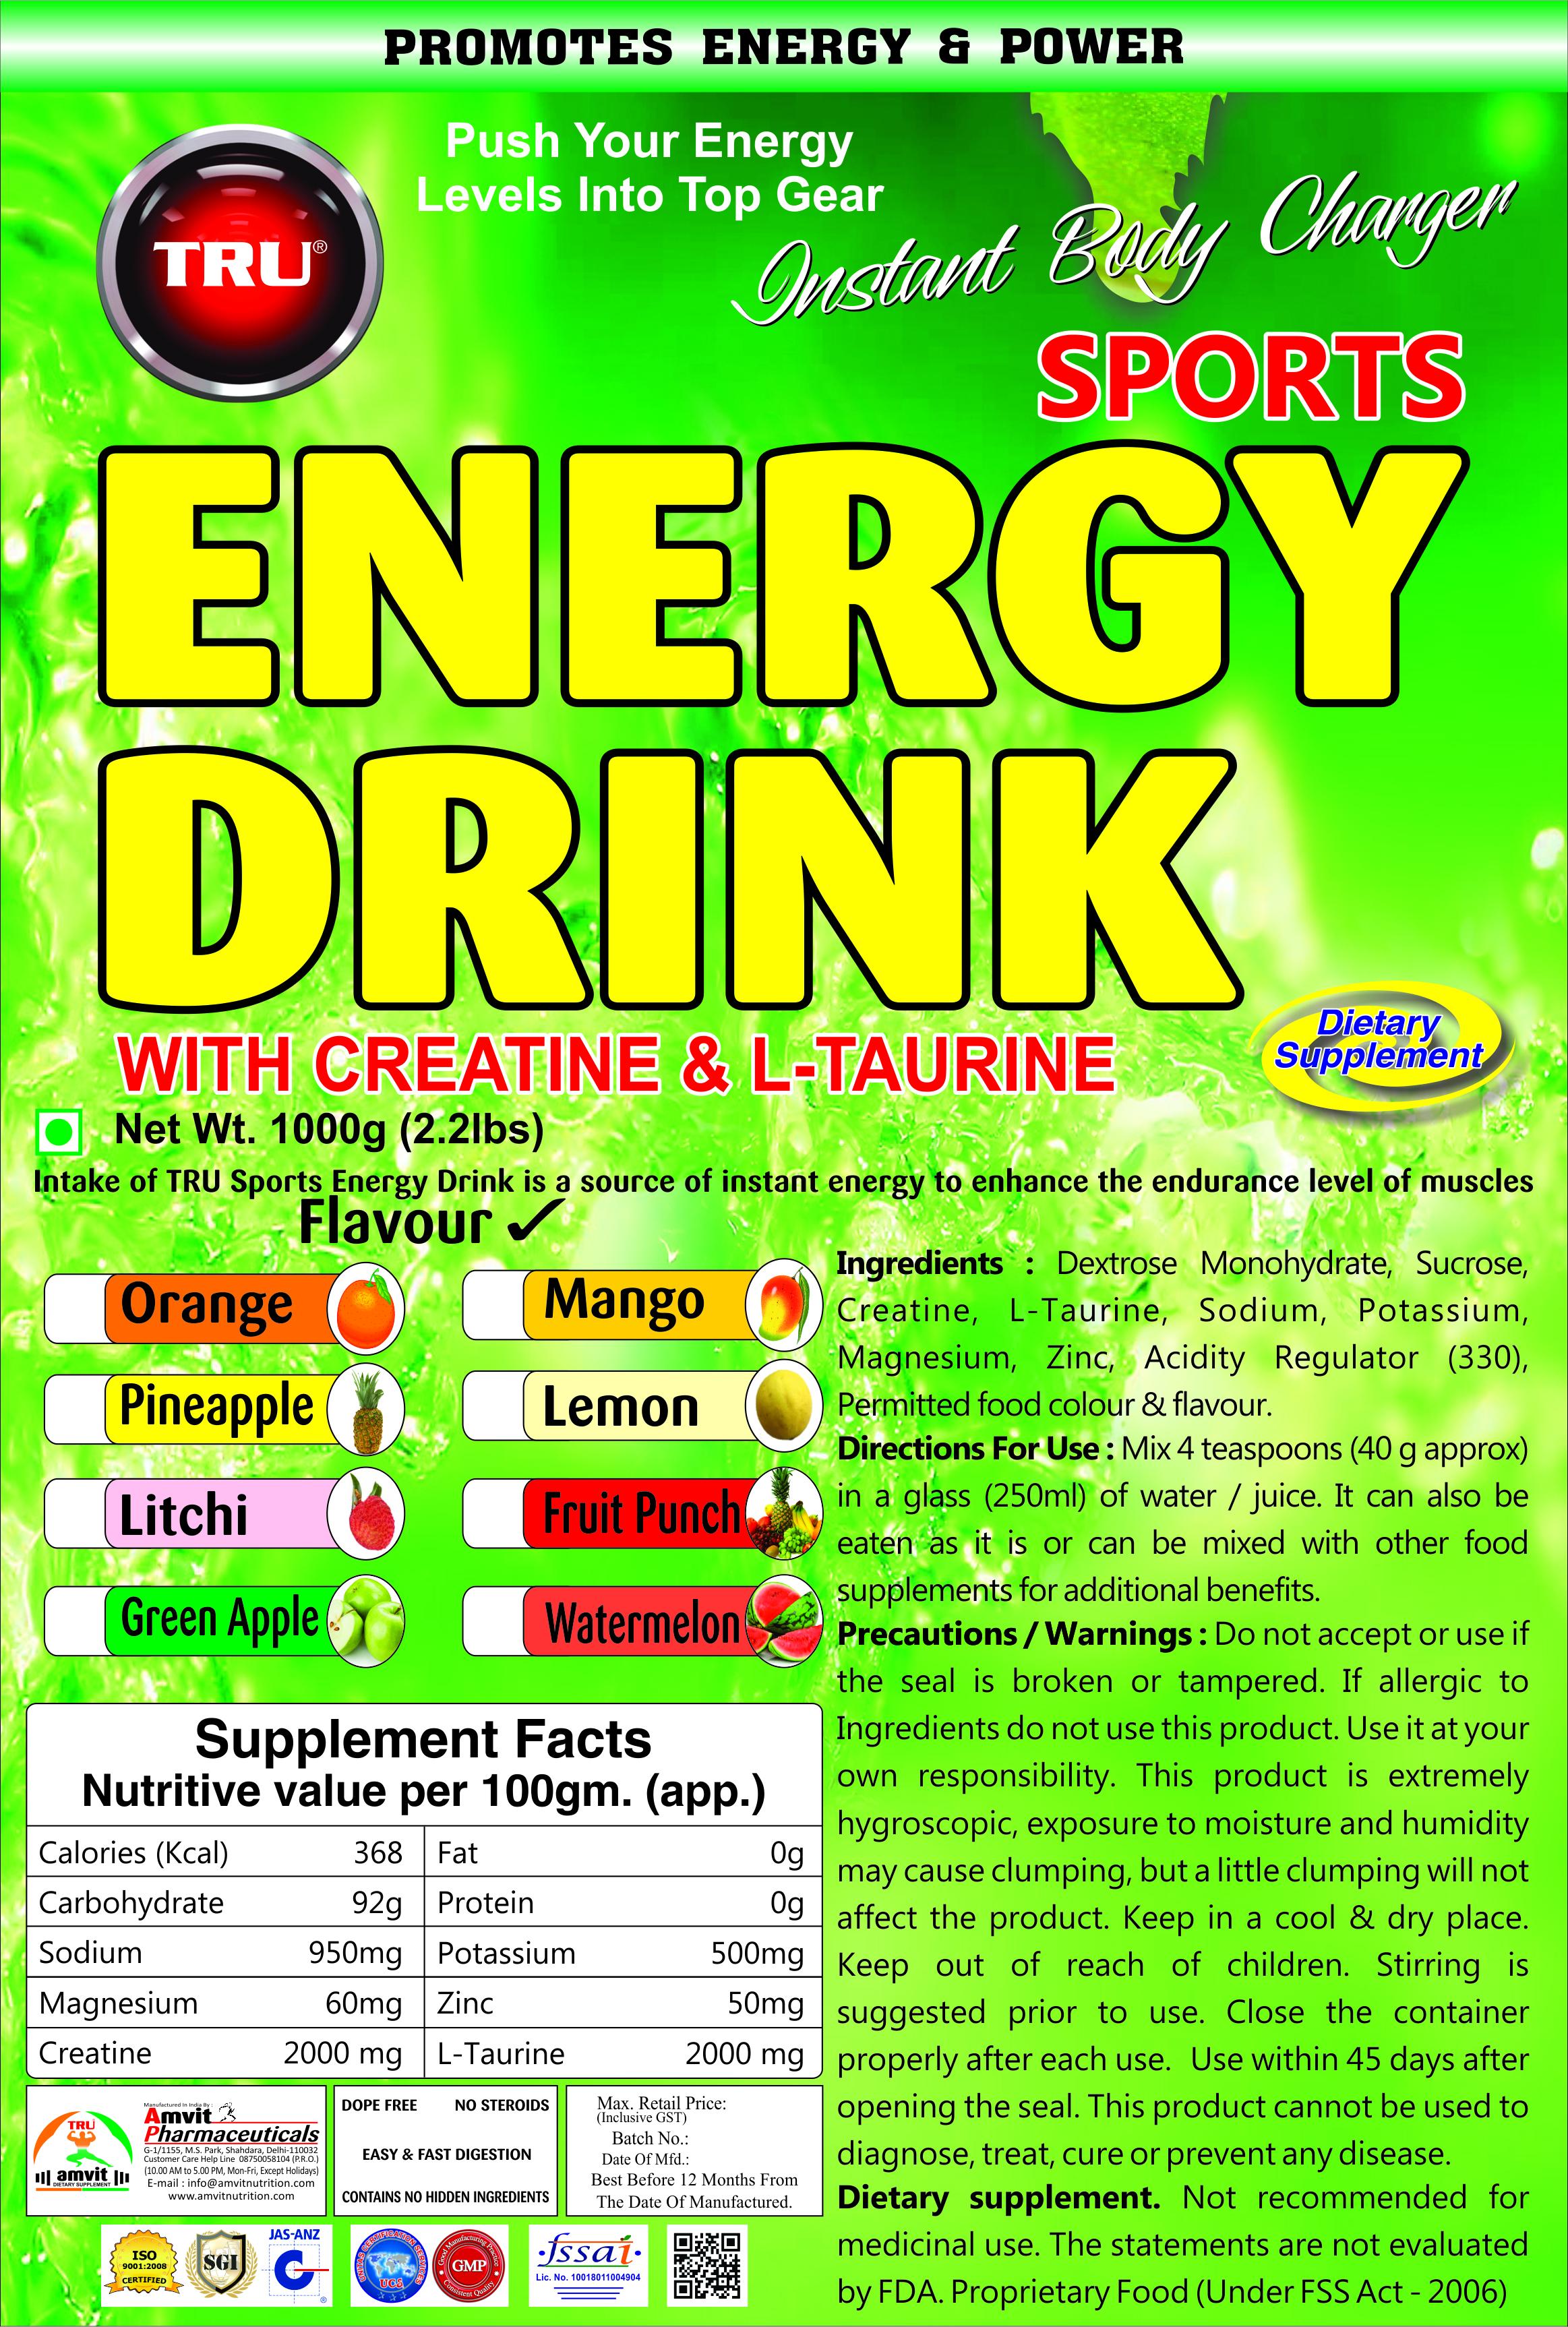 TRU ENERGY DRINK WITH CREATINE AND TAURINE